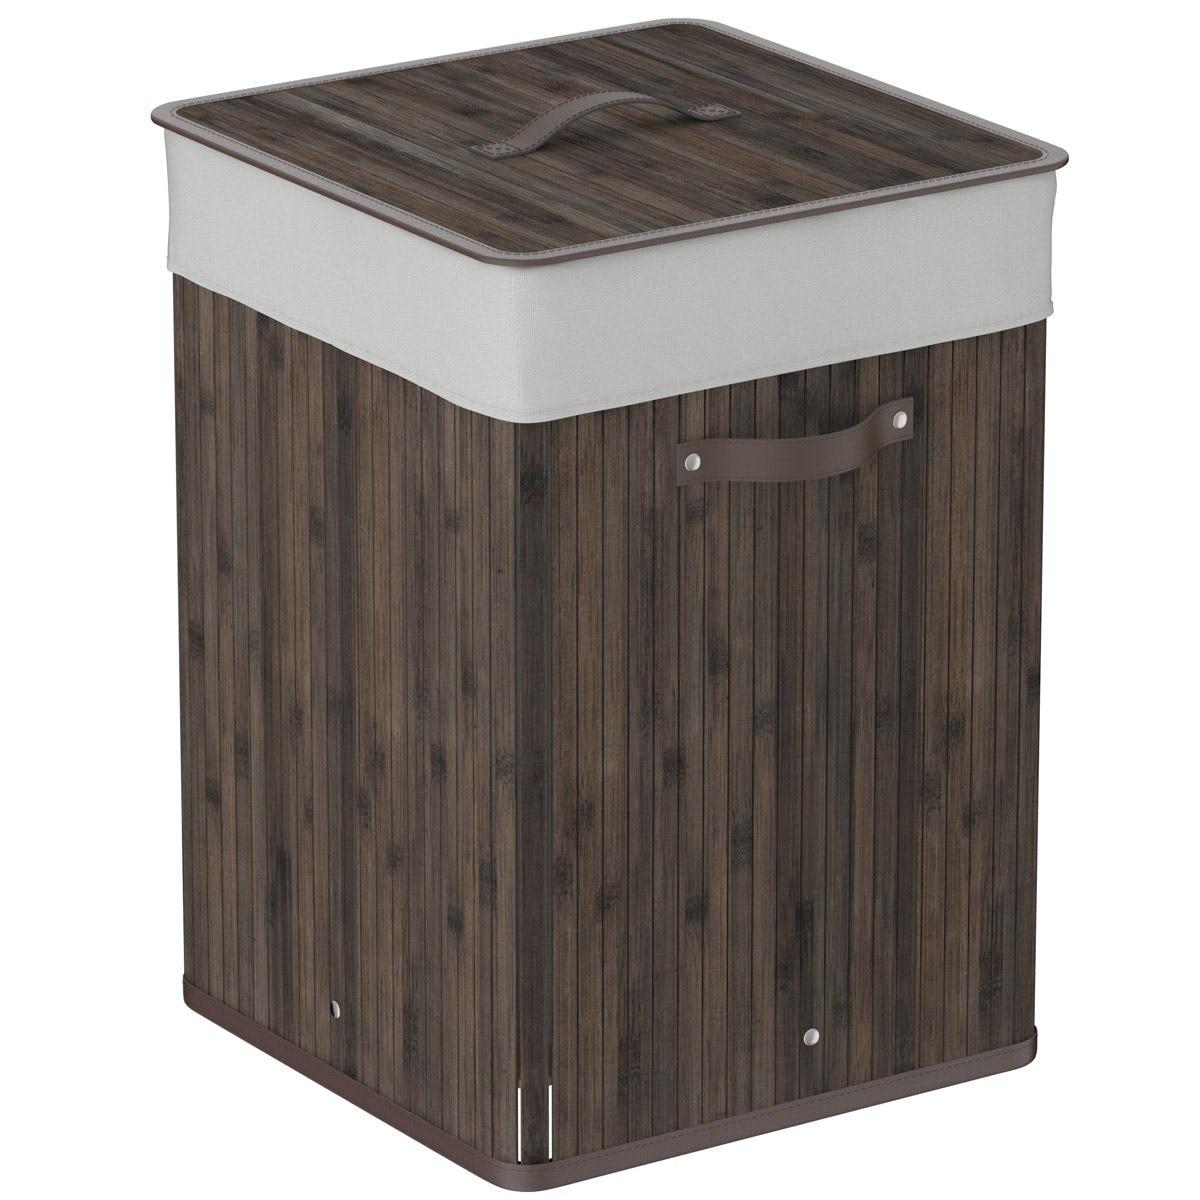 Natural bamboo dark brown square laundry basket